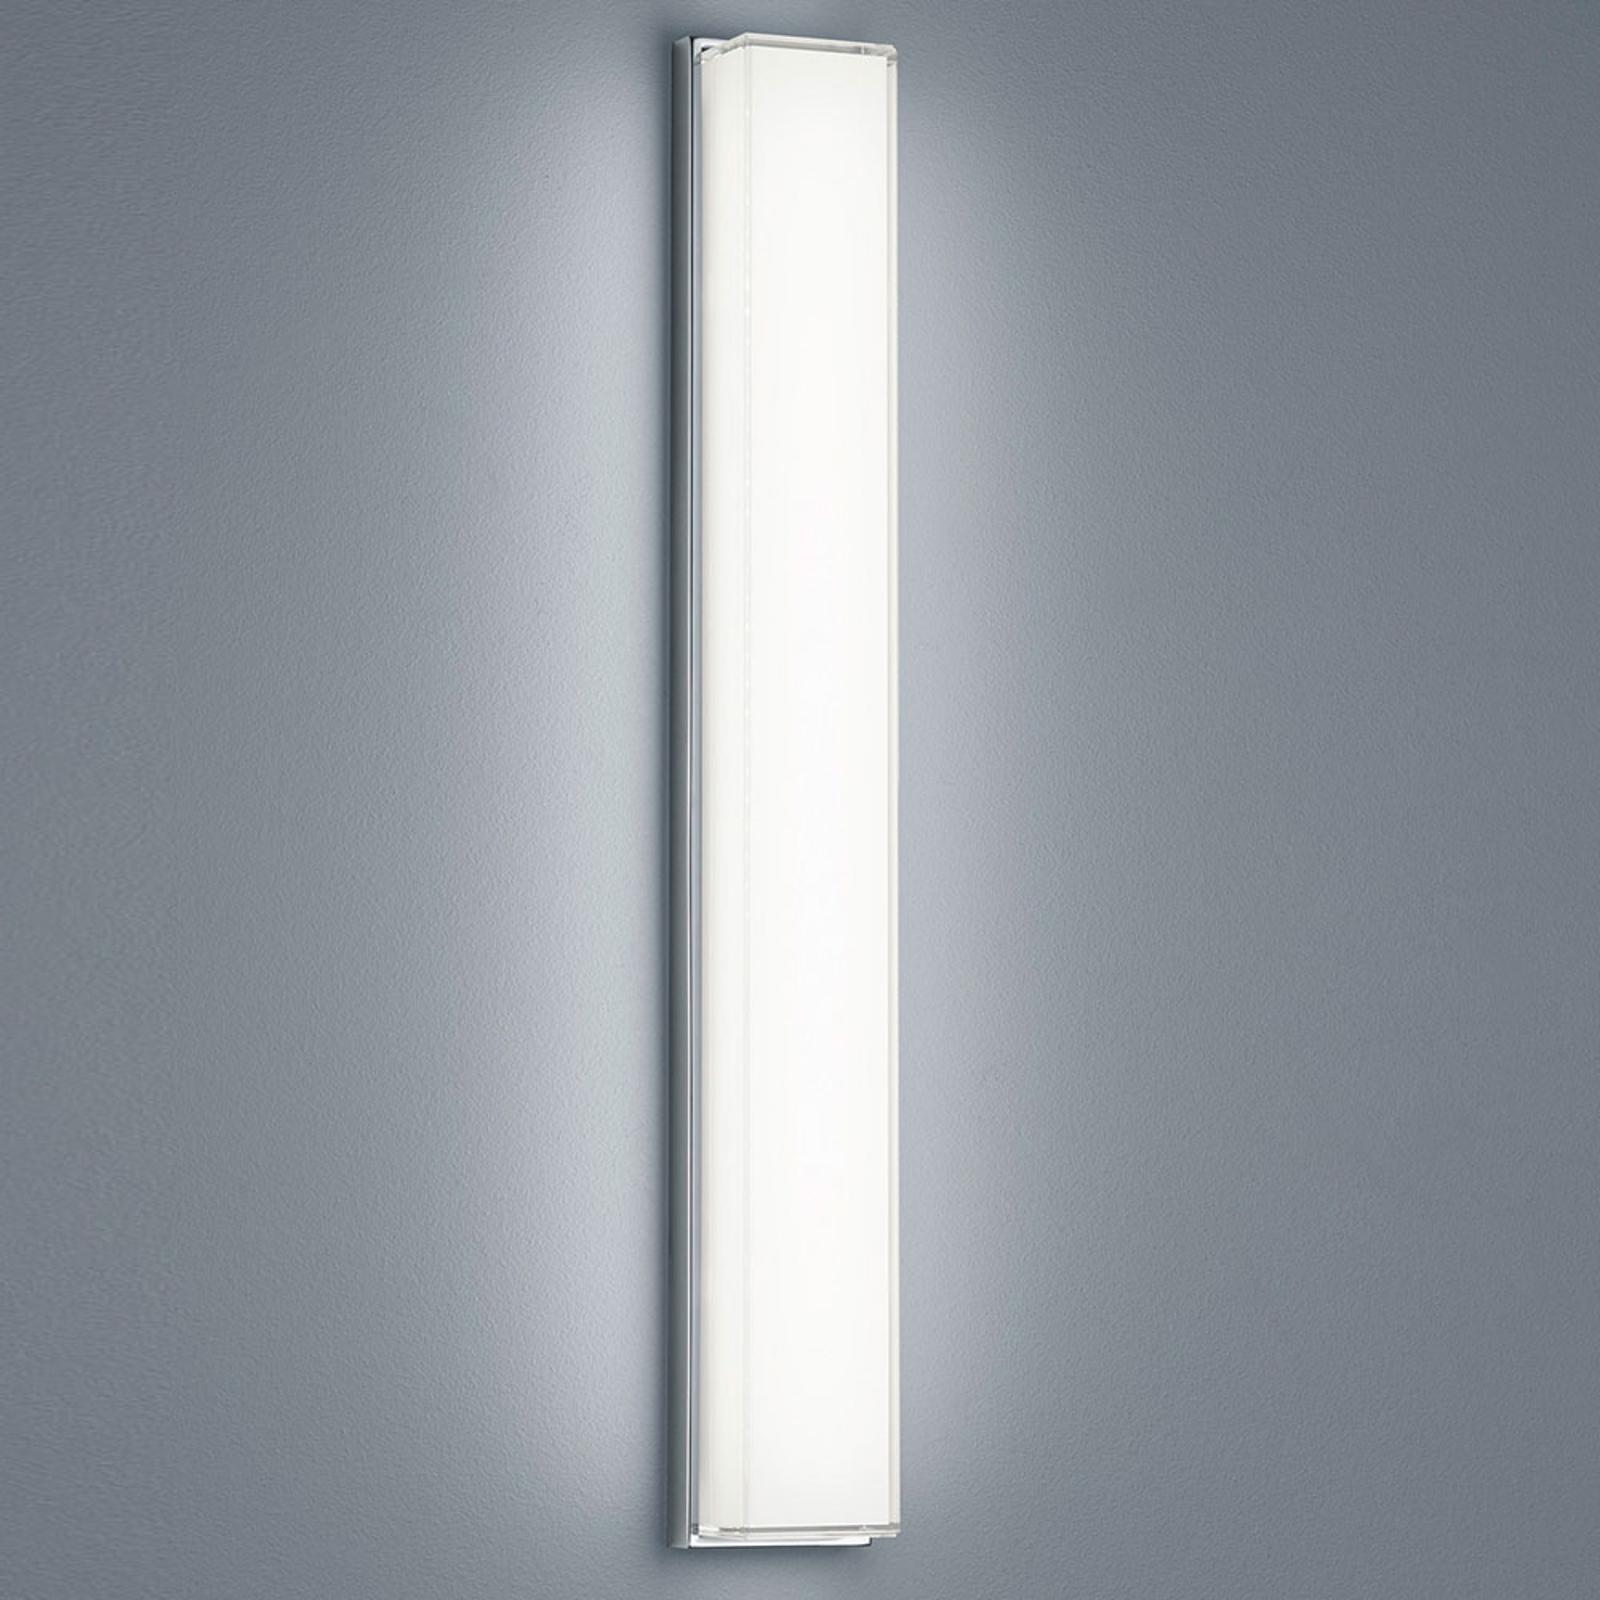 Helestra Cosi LED wandlamp chroom hoogte 61 cm